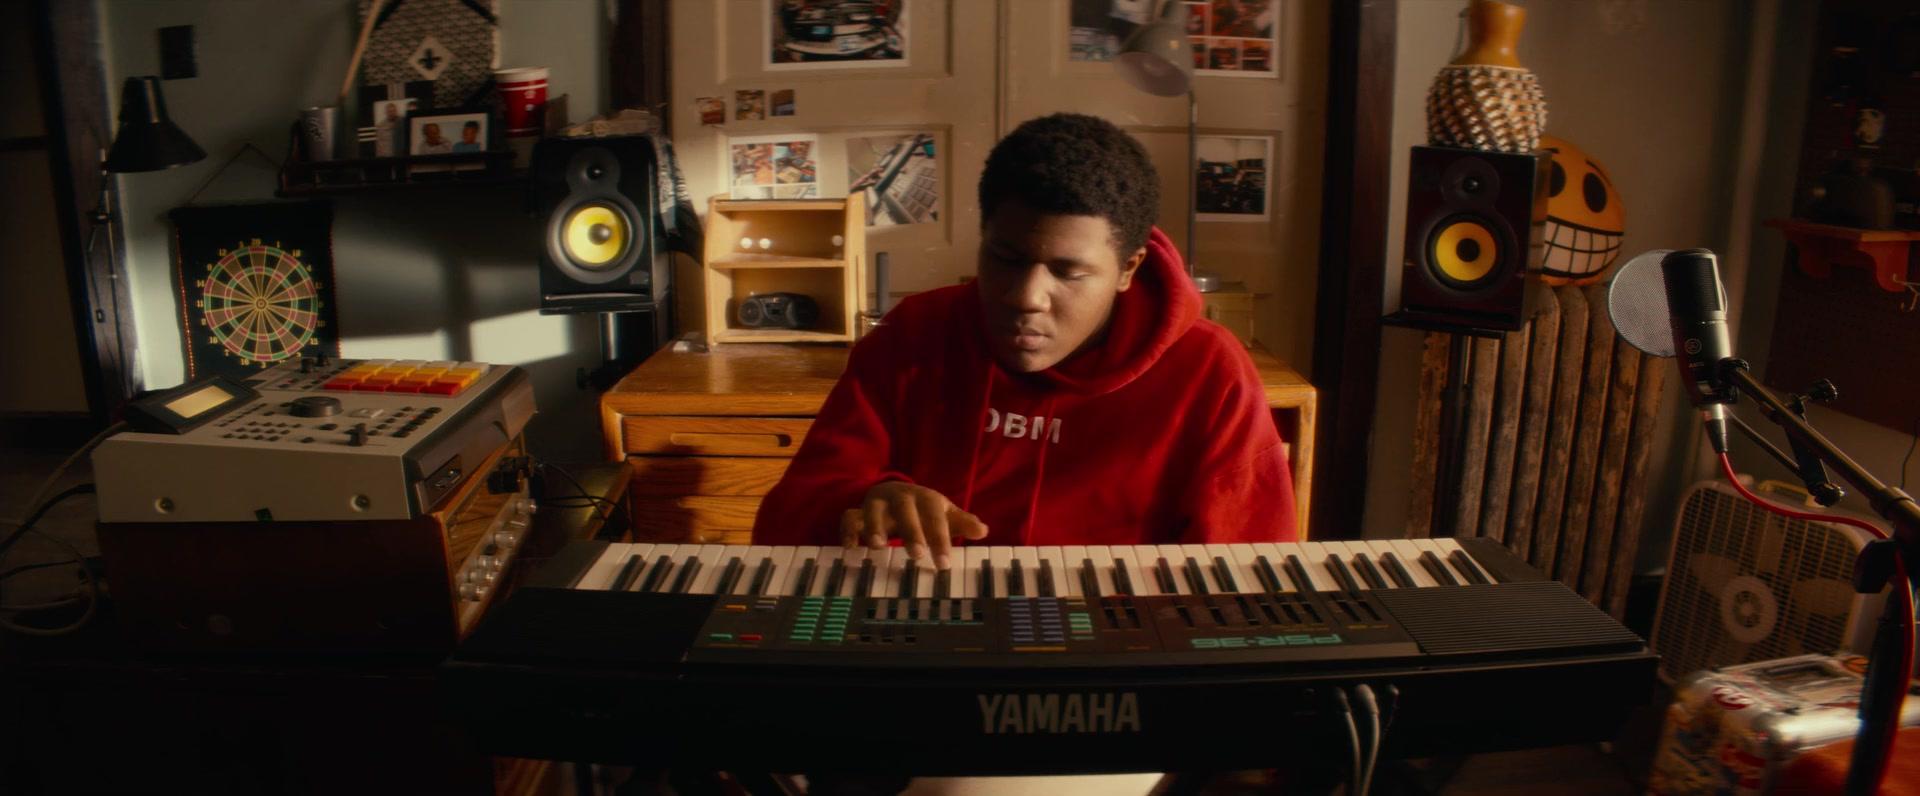 Yamaha Digital Piano Used by Khalil Everage in Beats (2019) Movie